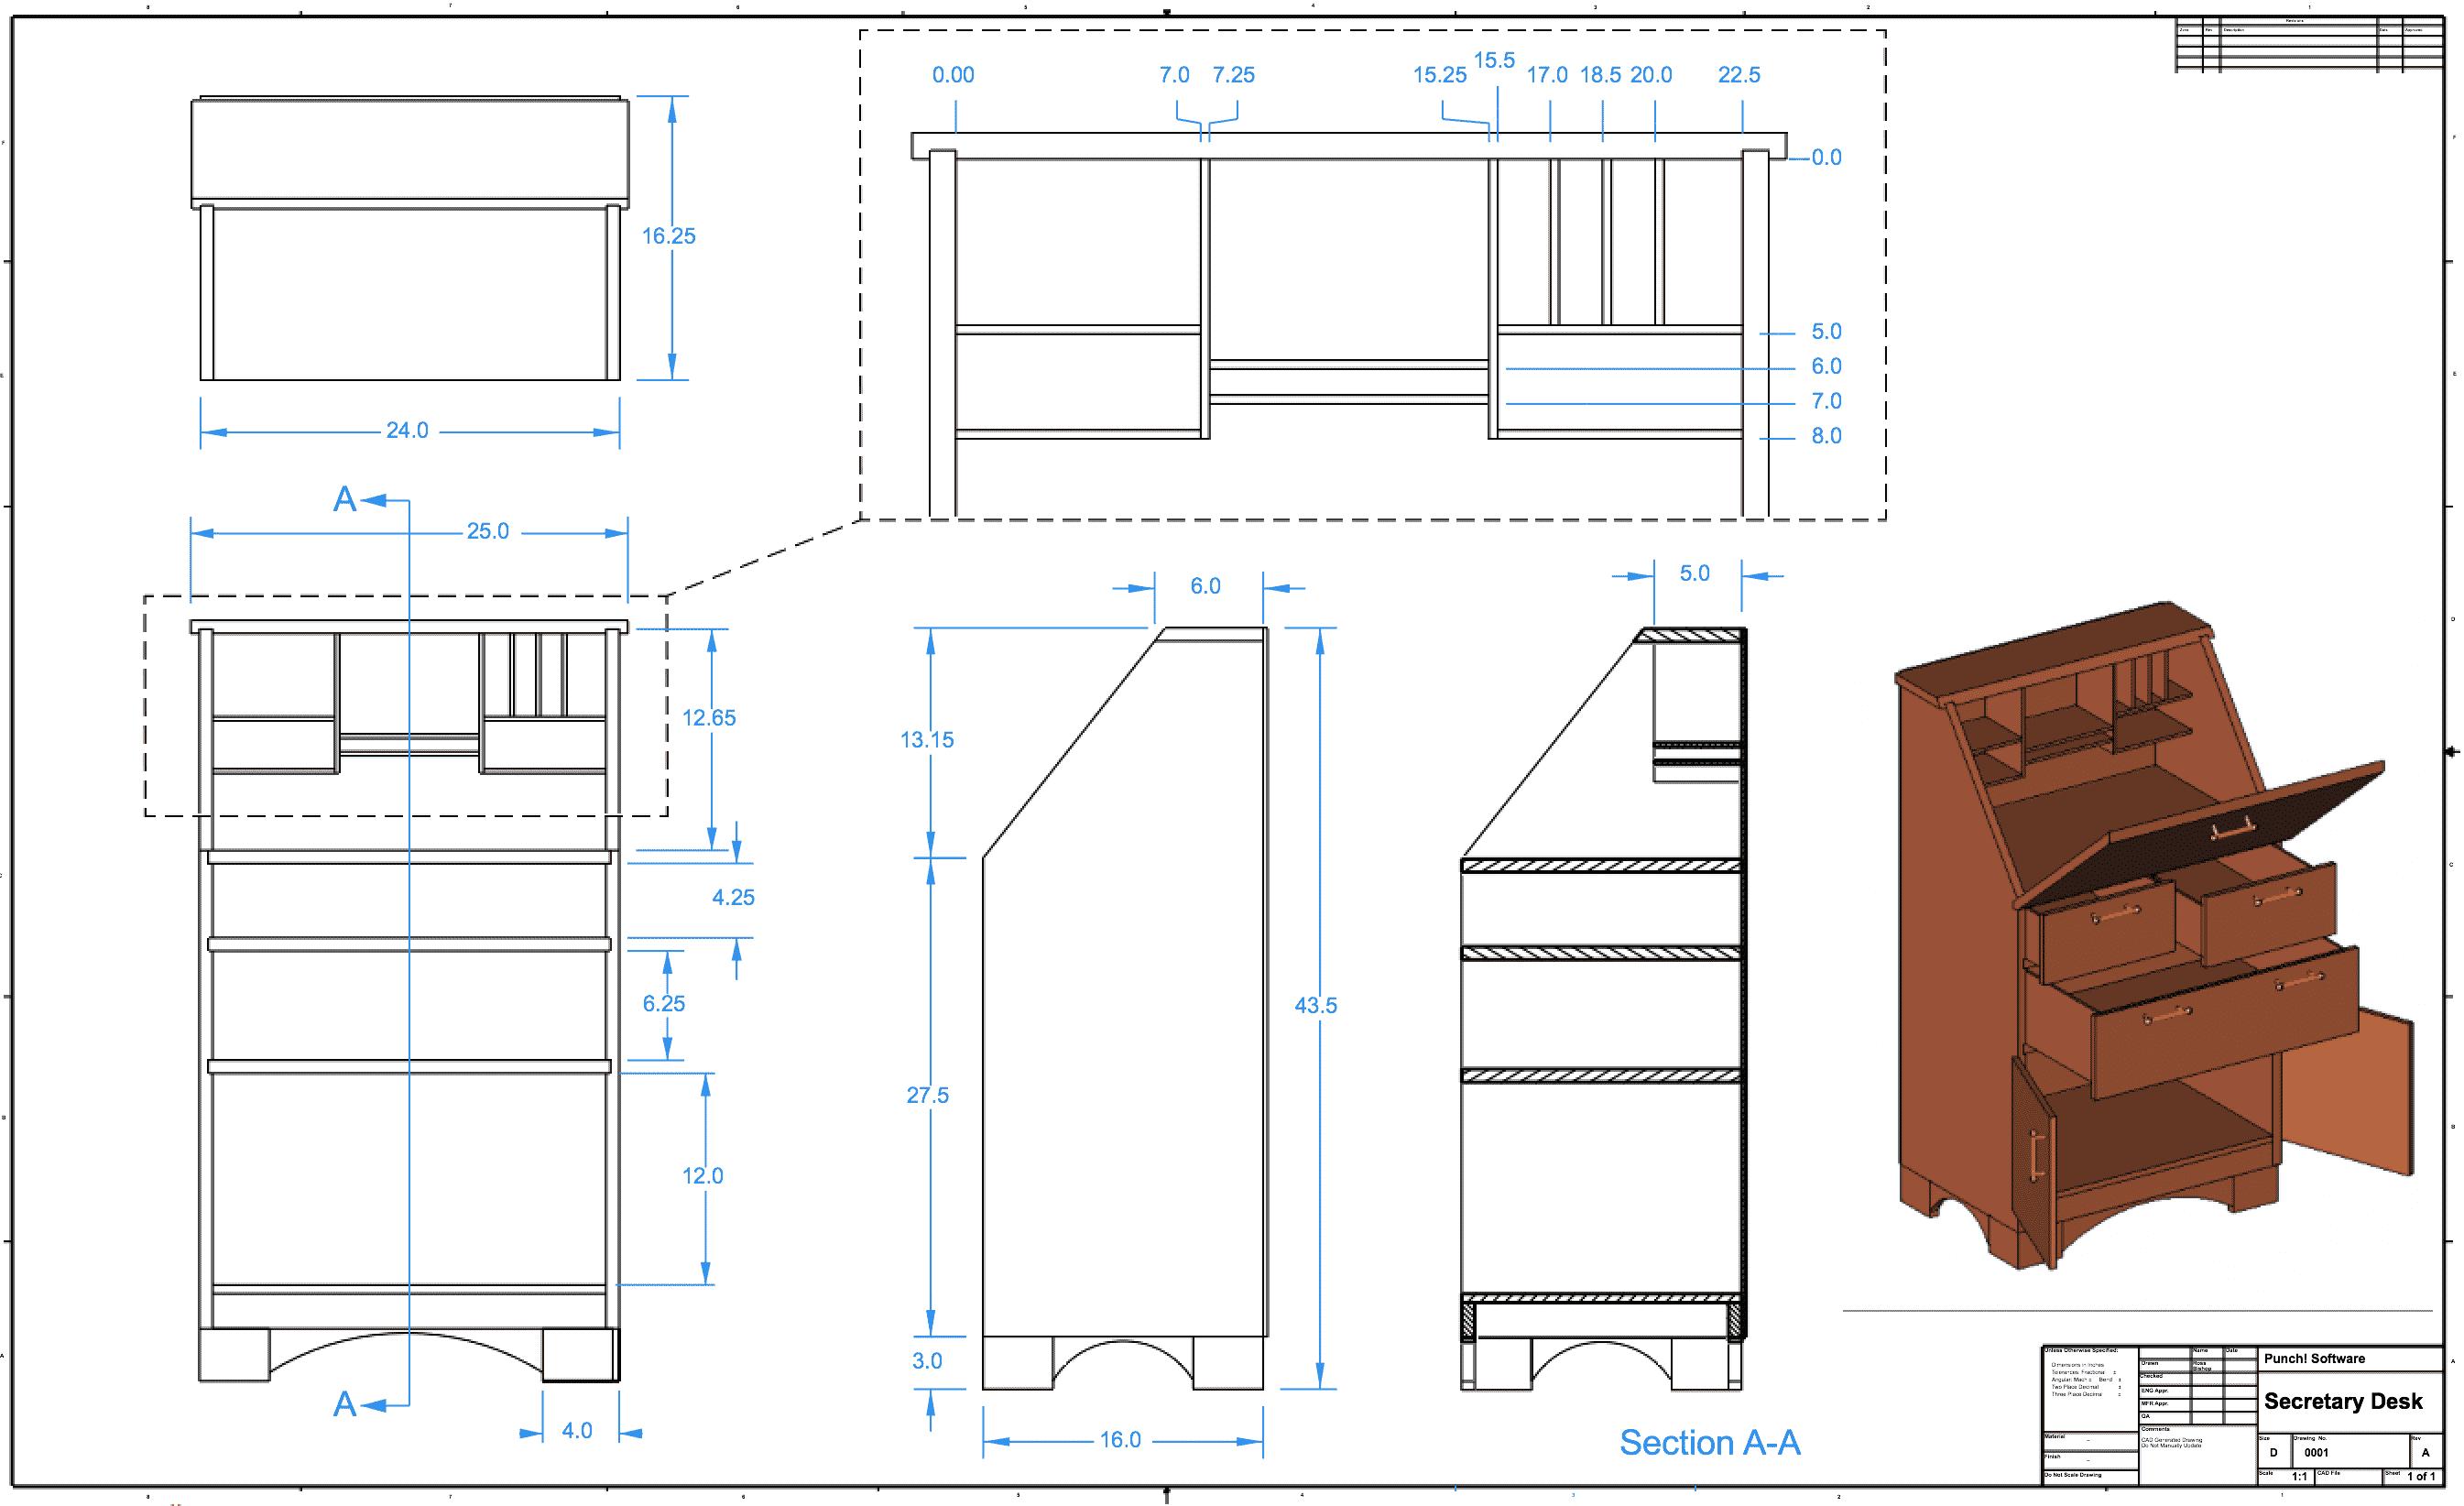 ViaCAD 2D/3D v9 with PowerPack LT